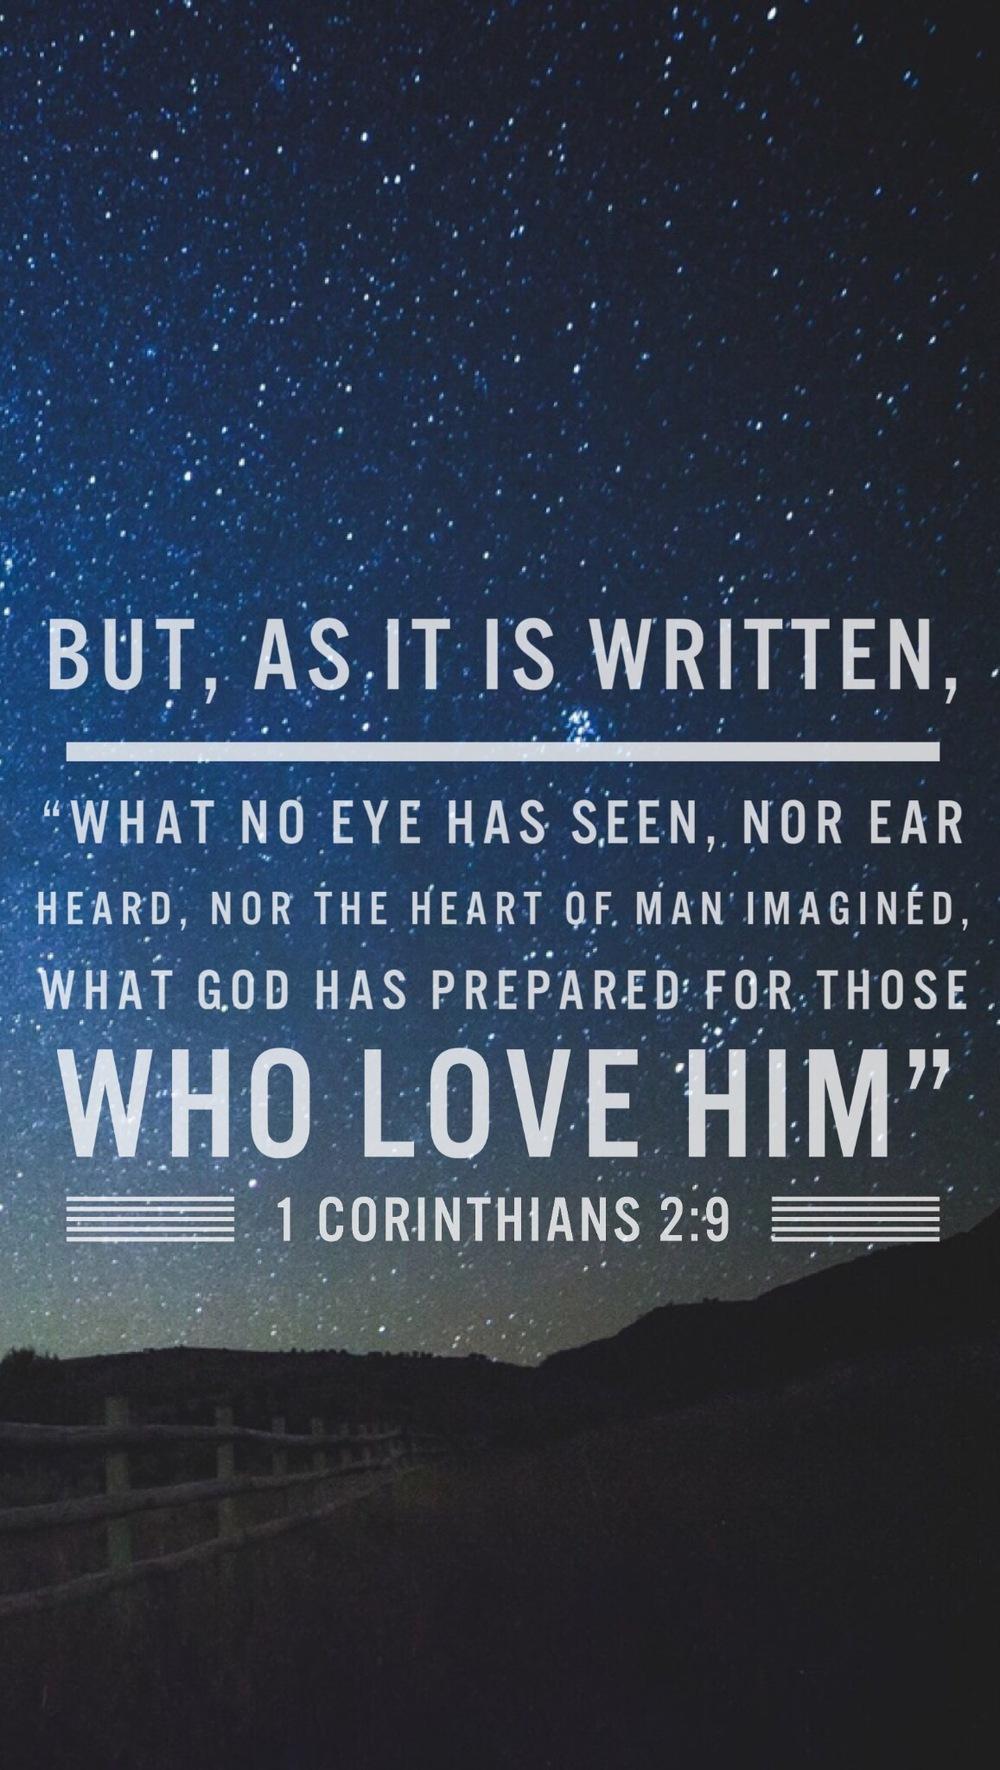 1 Corinthians 2.9.JPG